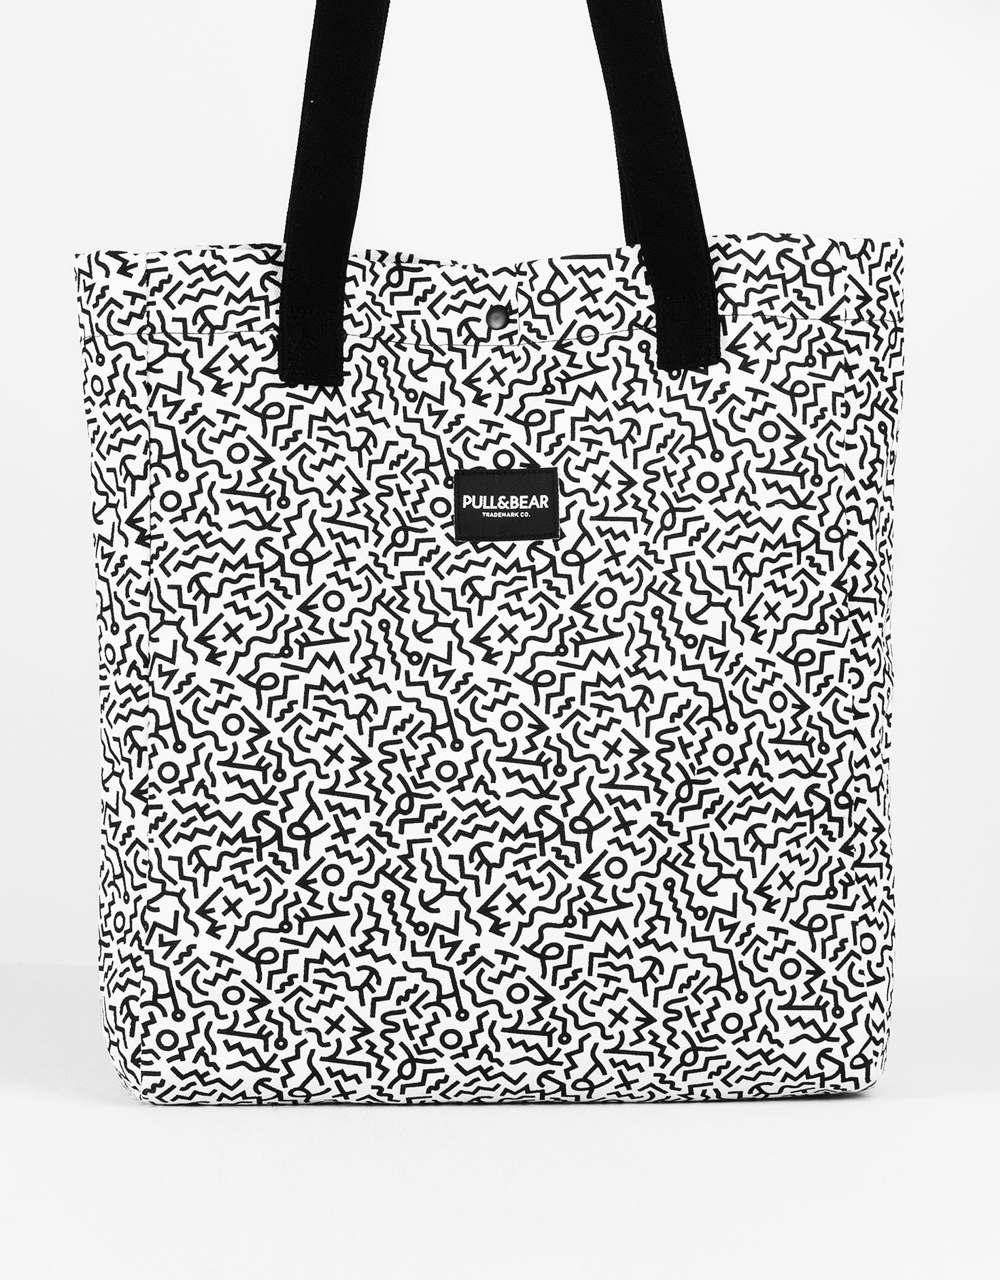 ARCHIVE_Pull&Bear Tote Bag.jpg